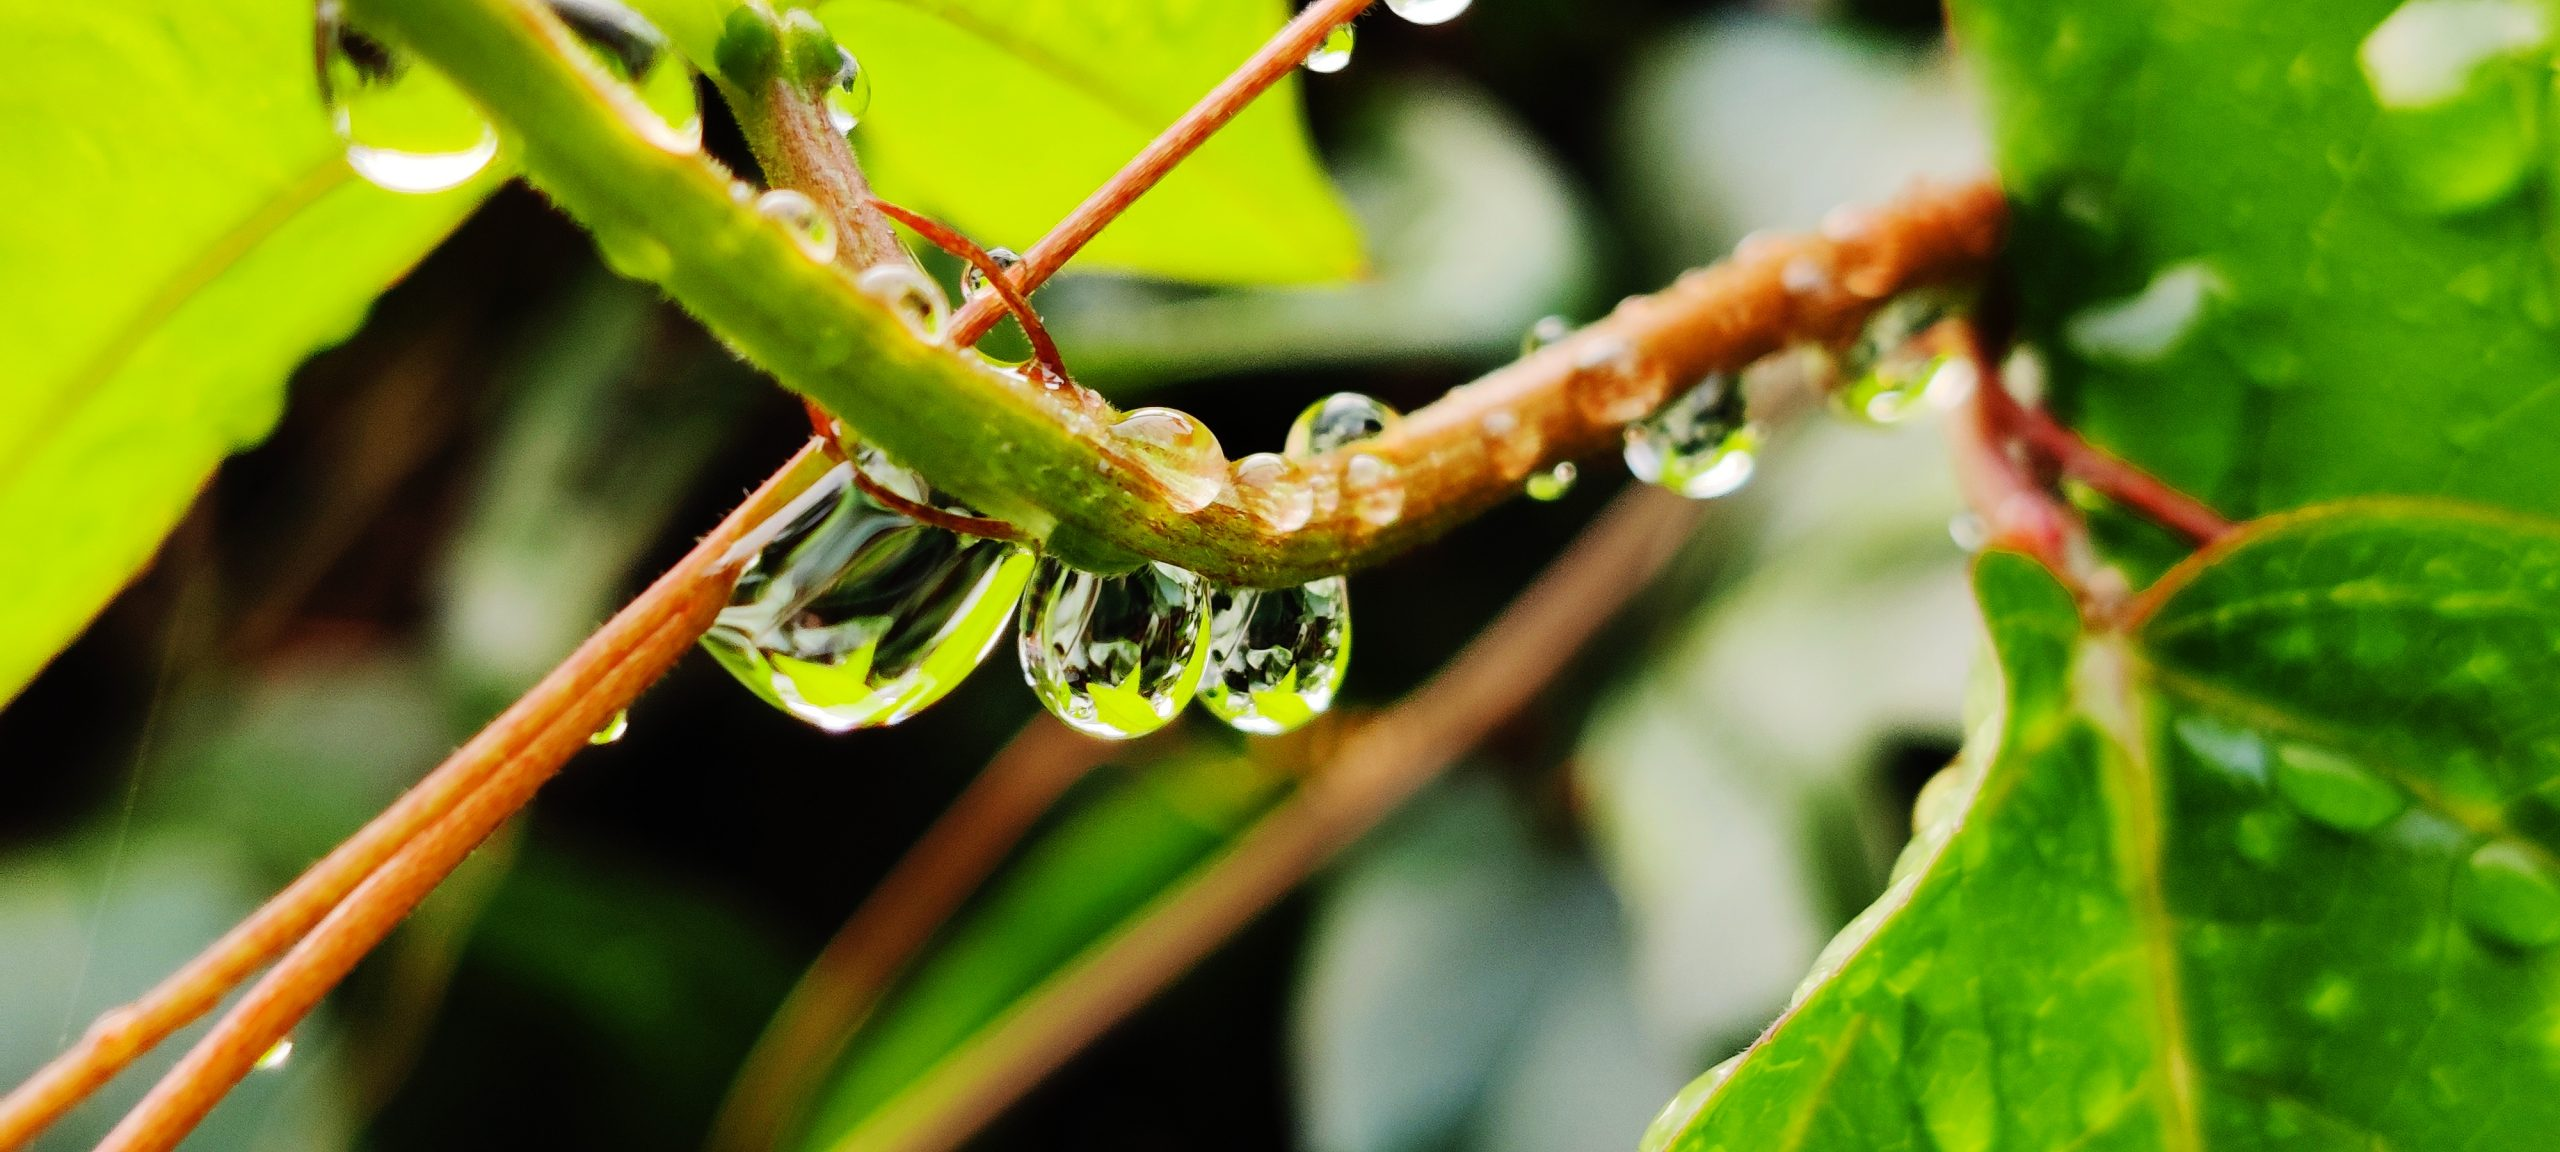 drops on a stem